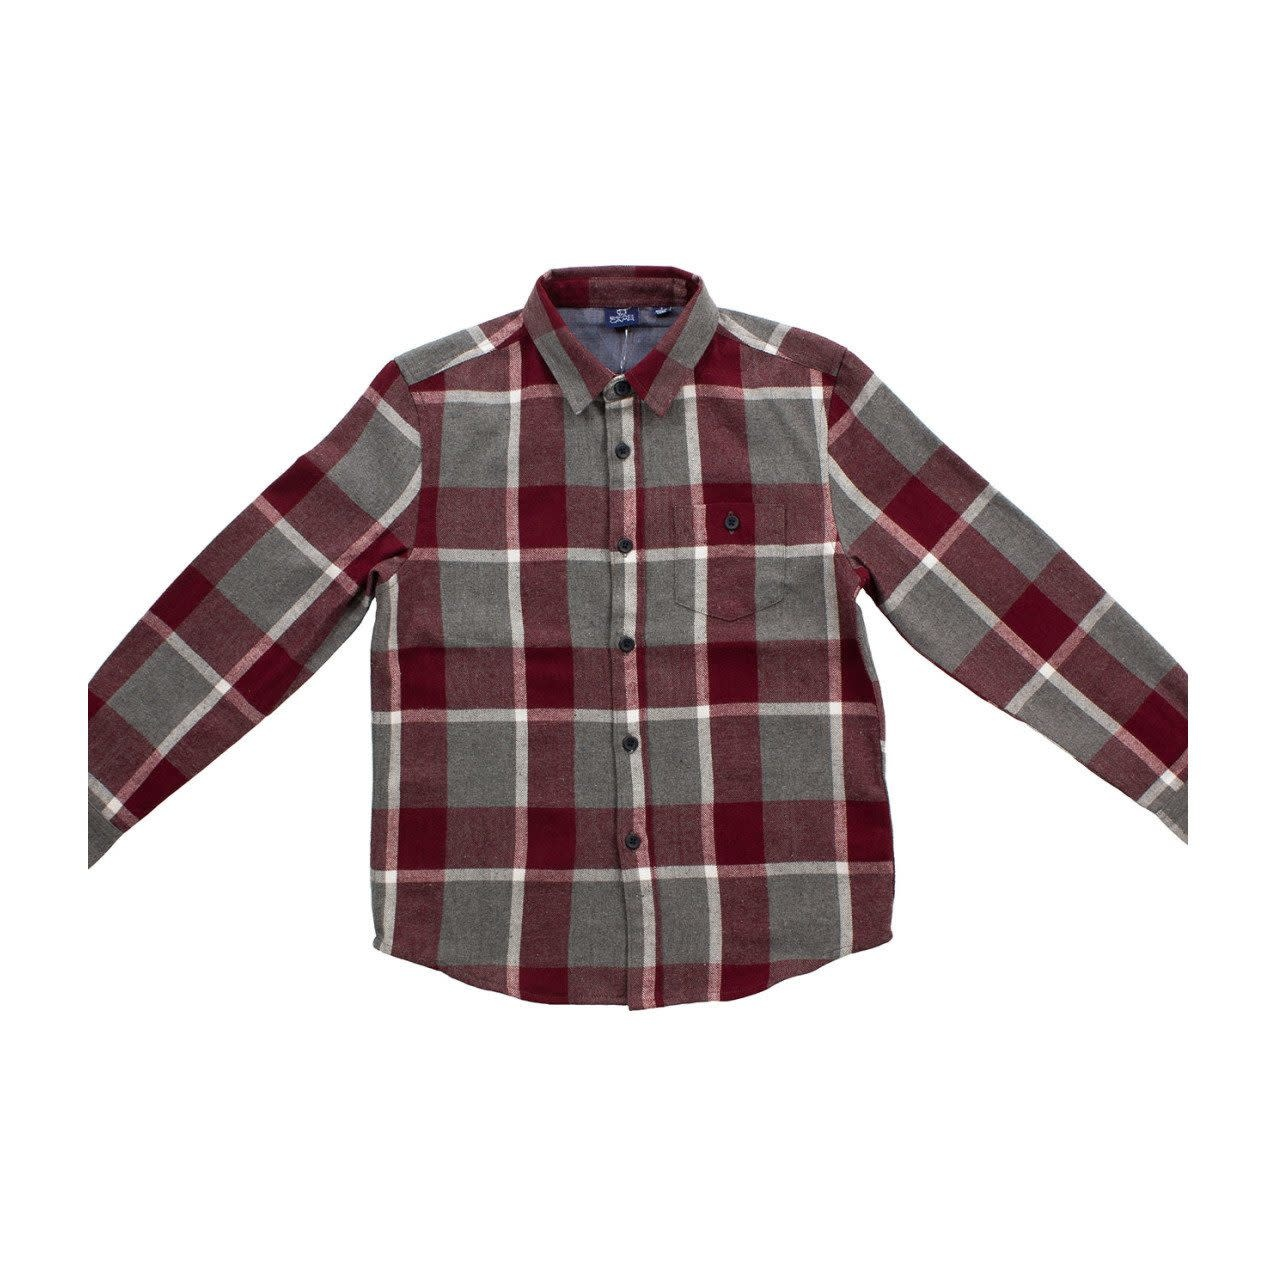 Bear Camp Boy's L/S Flannel Shirt